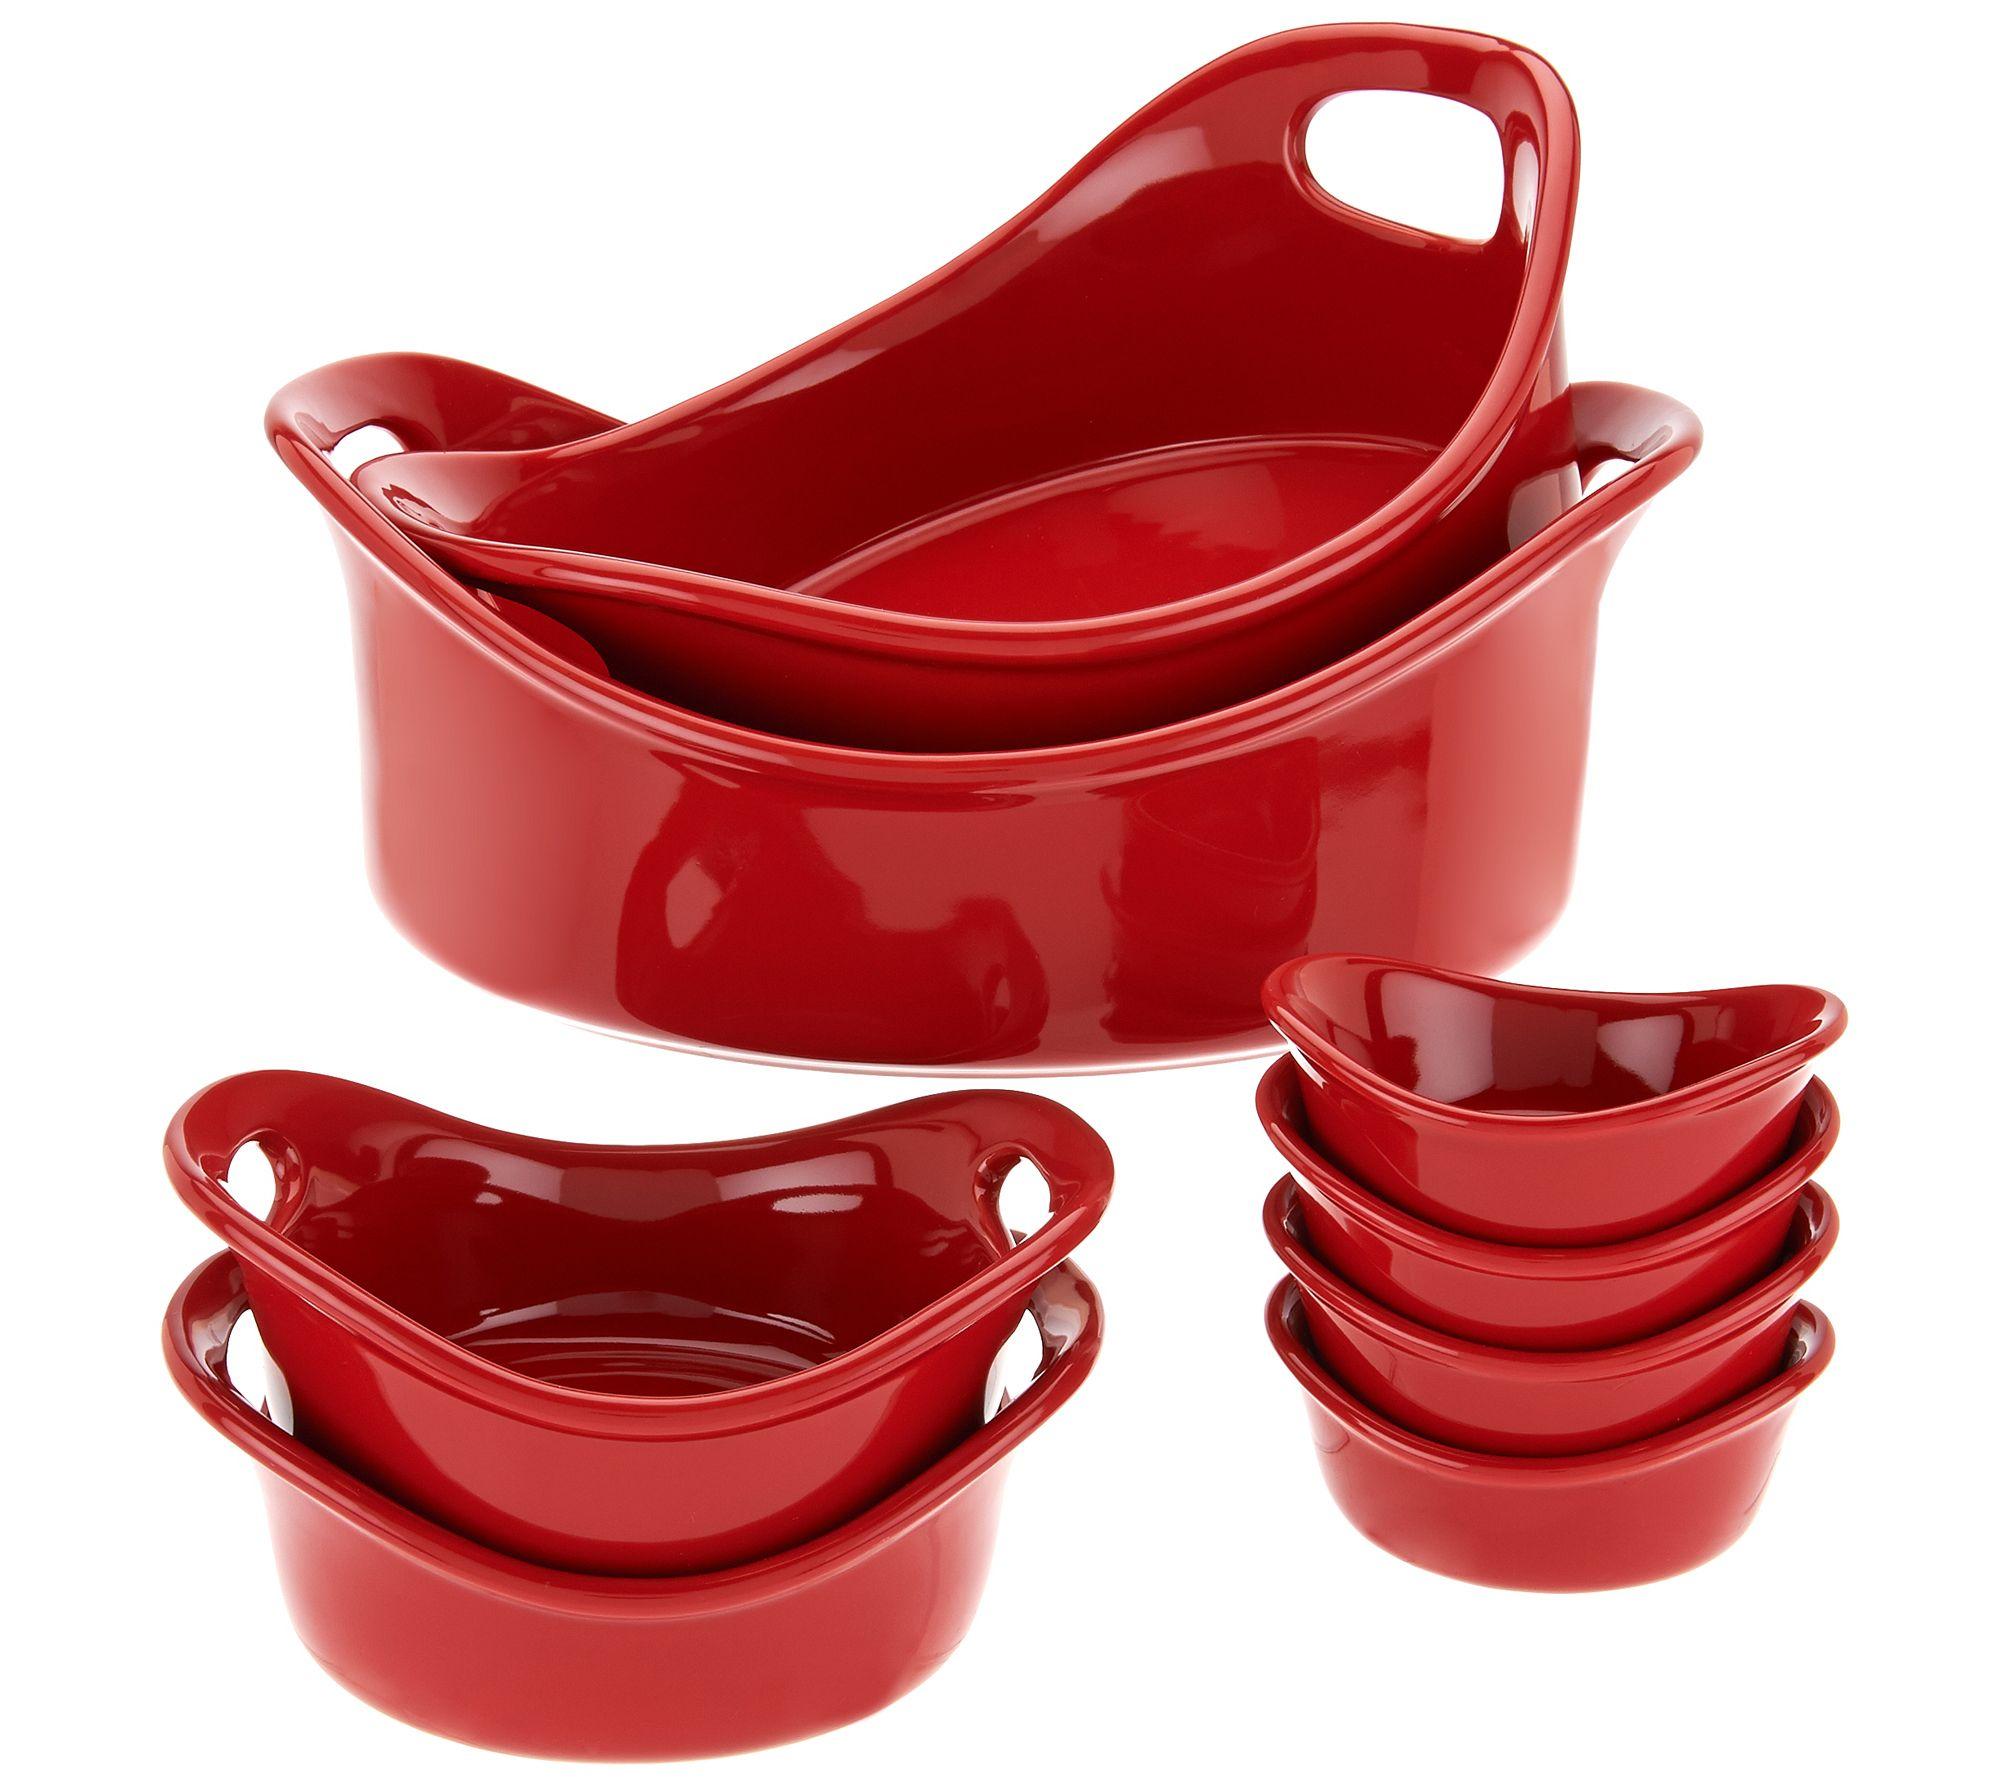 rachael ray bubble u0026 brown 8piece round bakeware set page 1 u2014 qvccom - Bakeware Sets